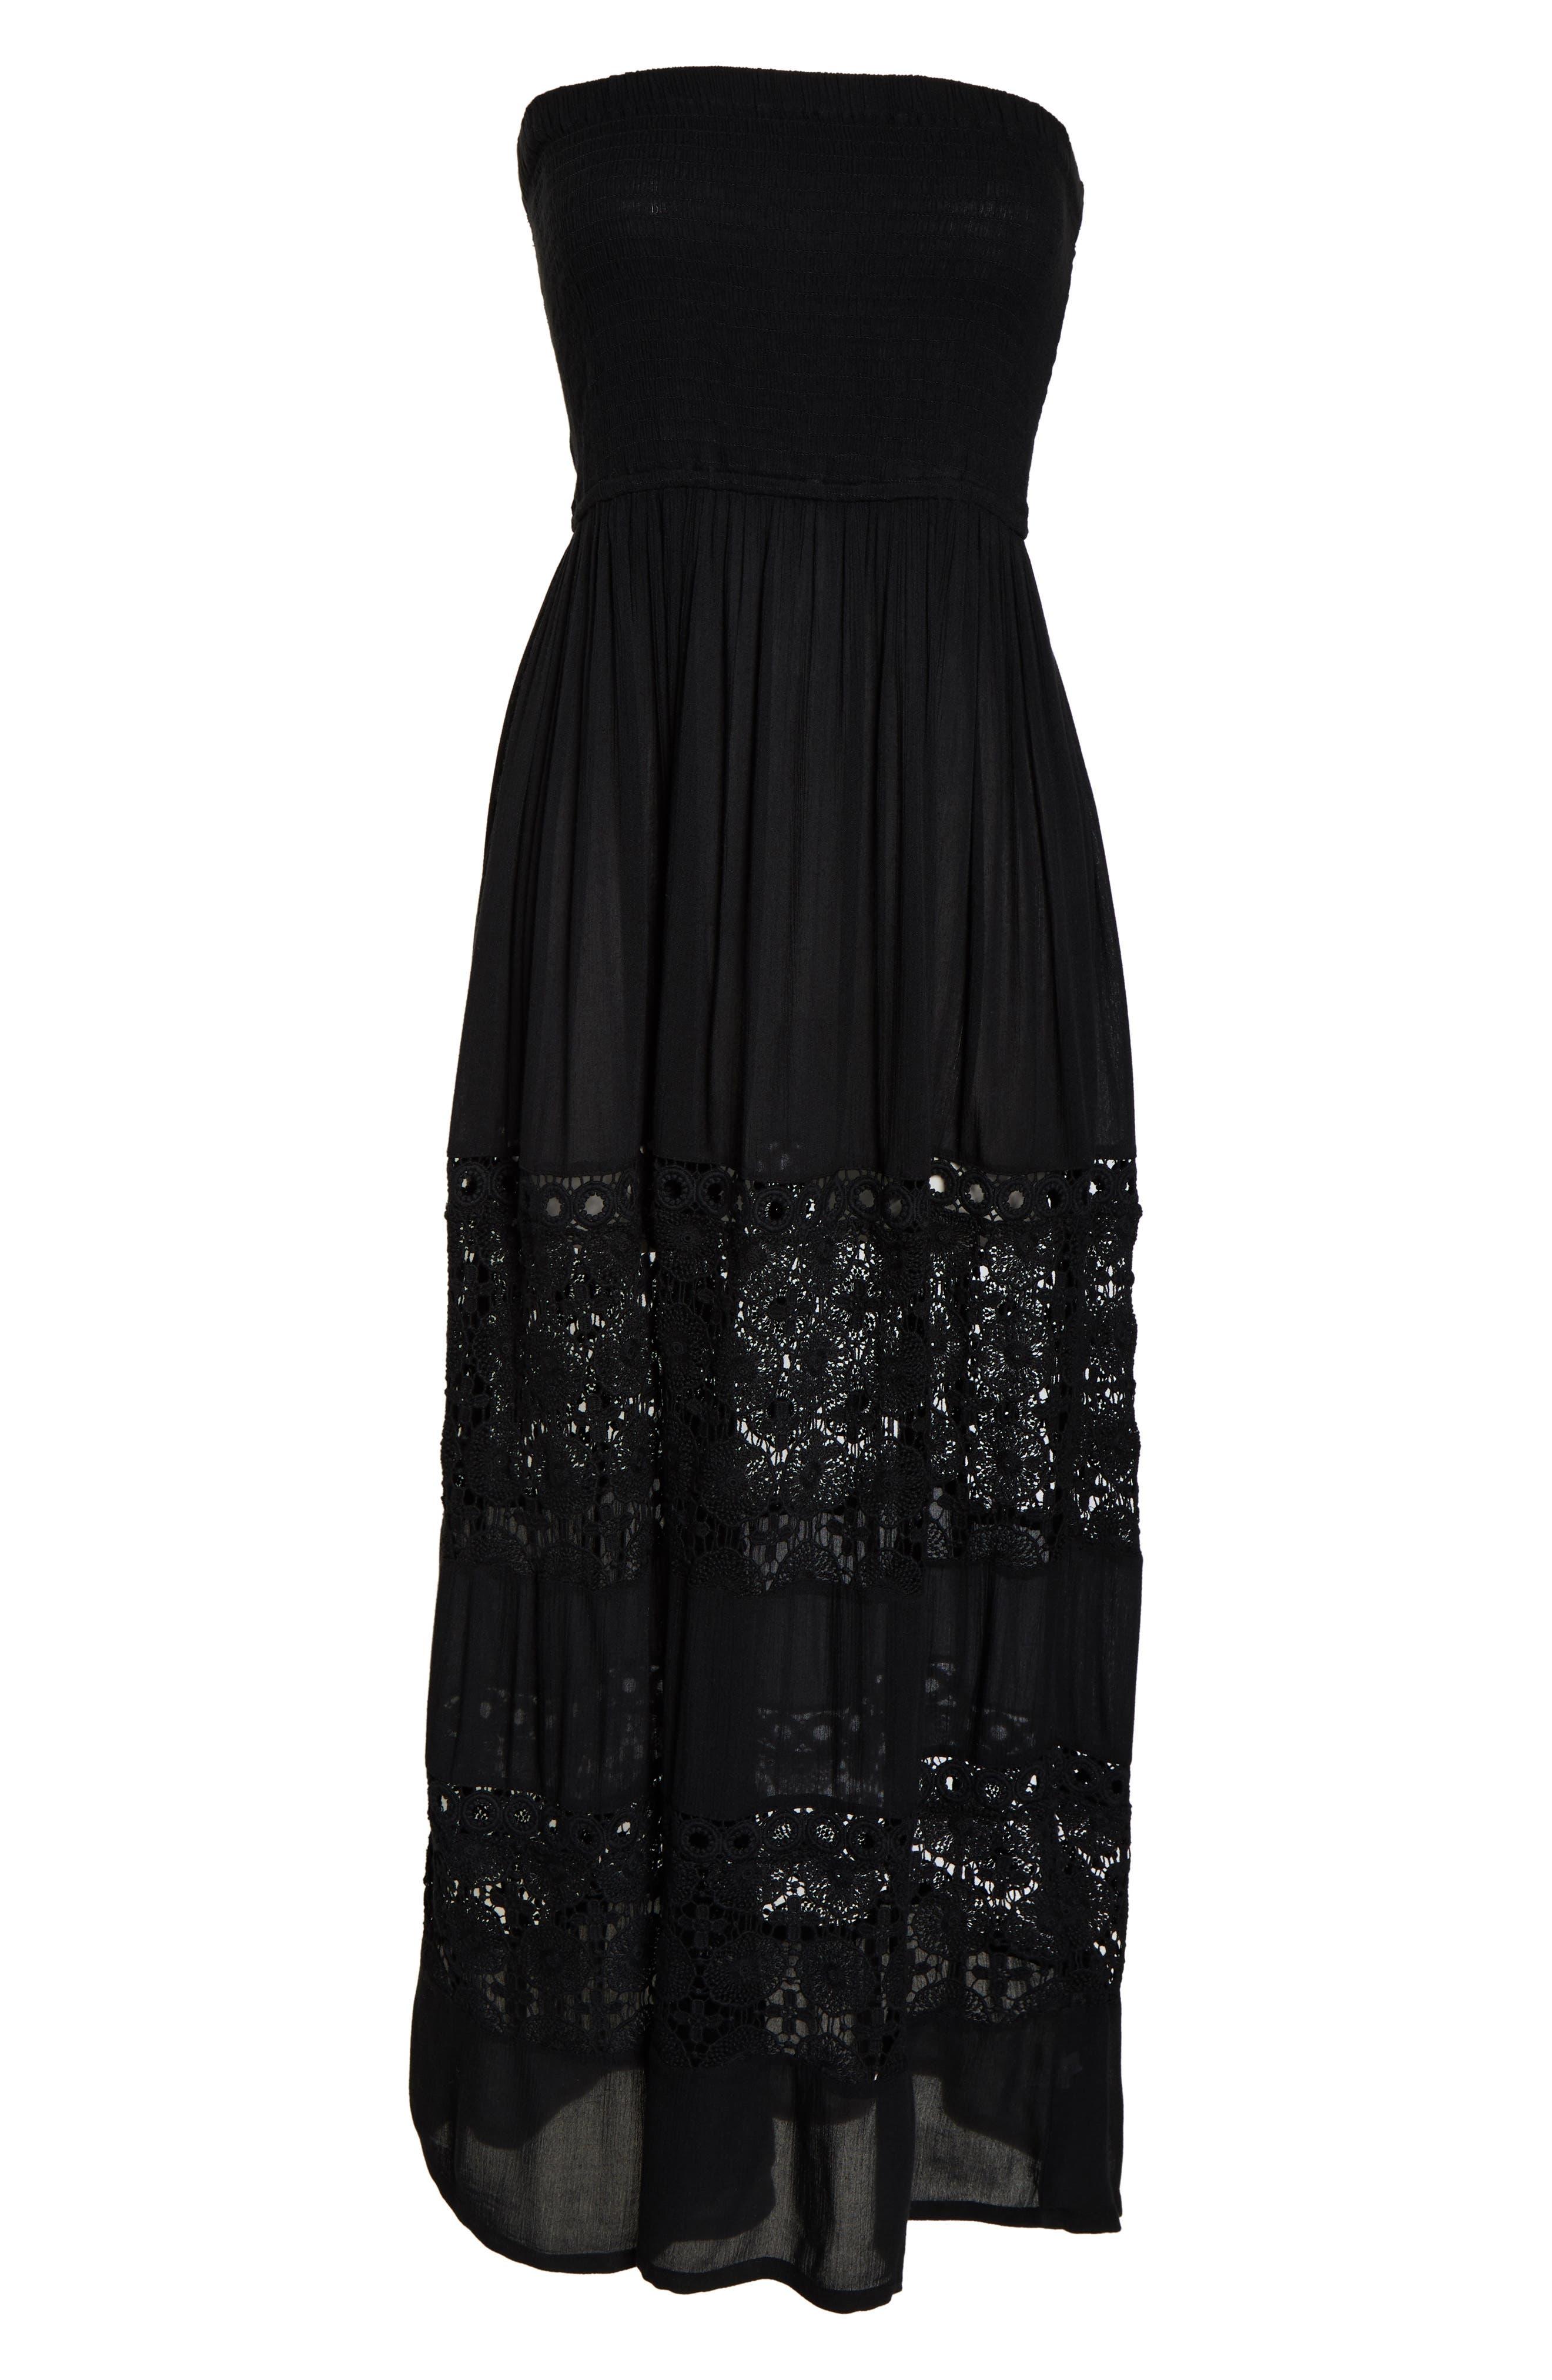 CHELSEA28, Farrah Smocked Cover-Up Maxi Dress, Alternate thumbnail 7, color, BLACK